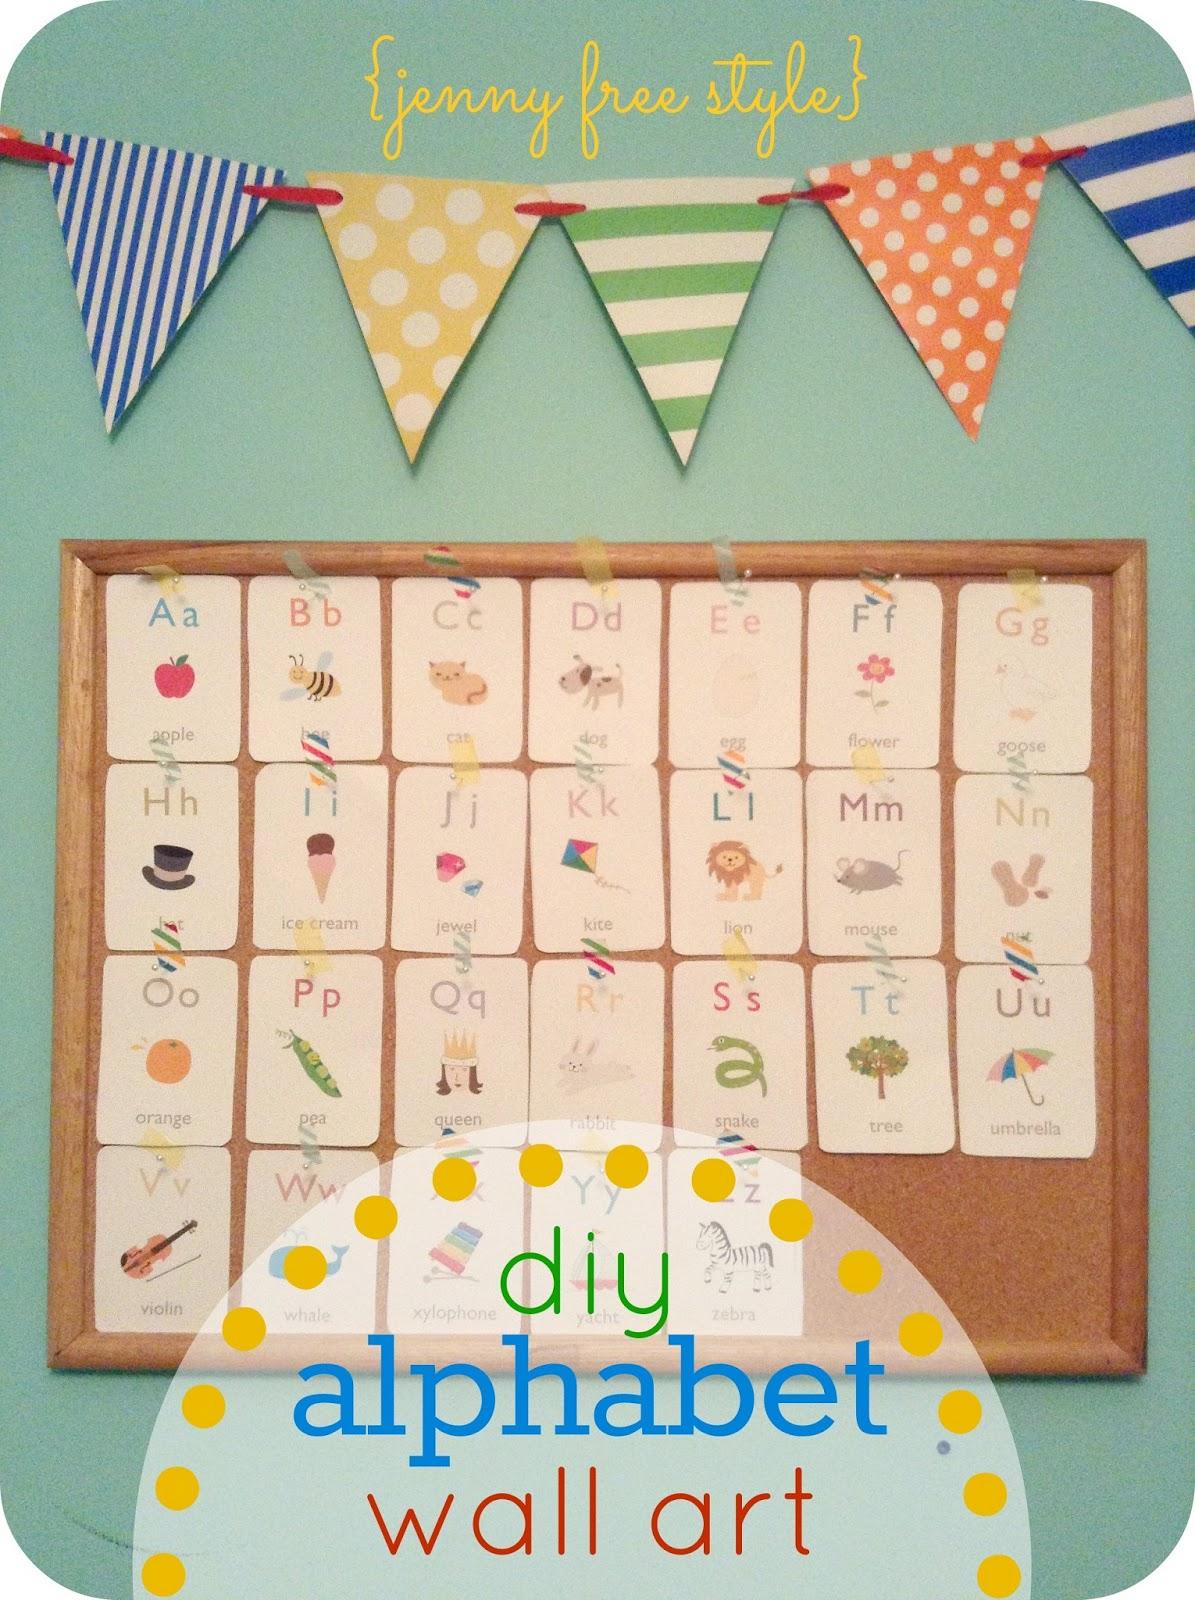 Diy Alphabet Wall Decor : Jenny free style diy alphabet wall art